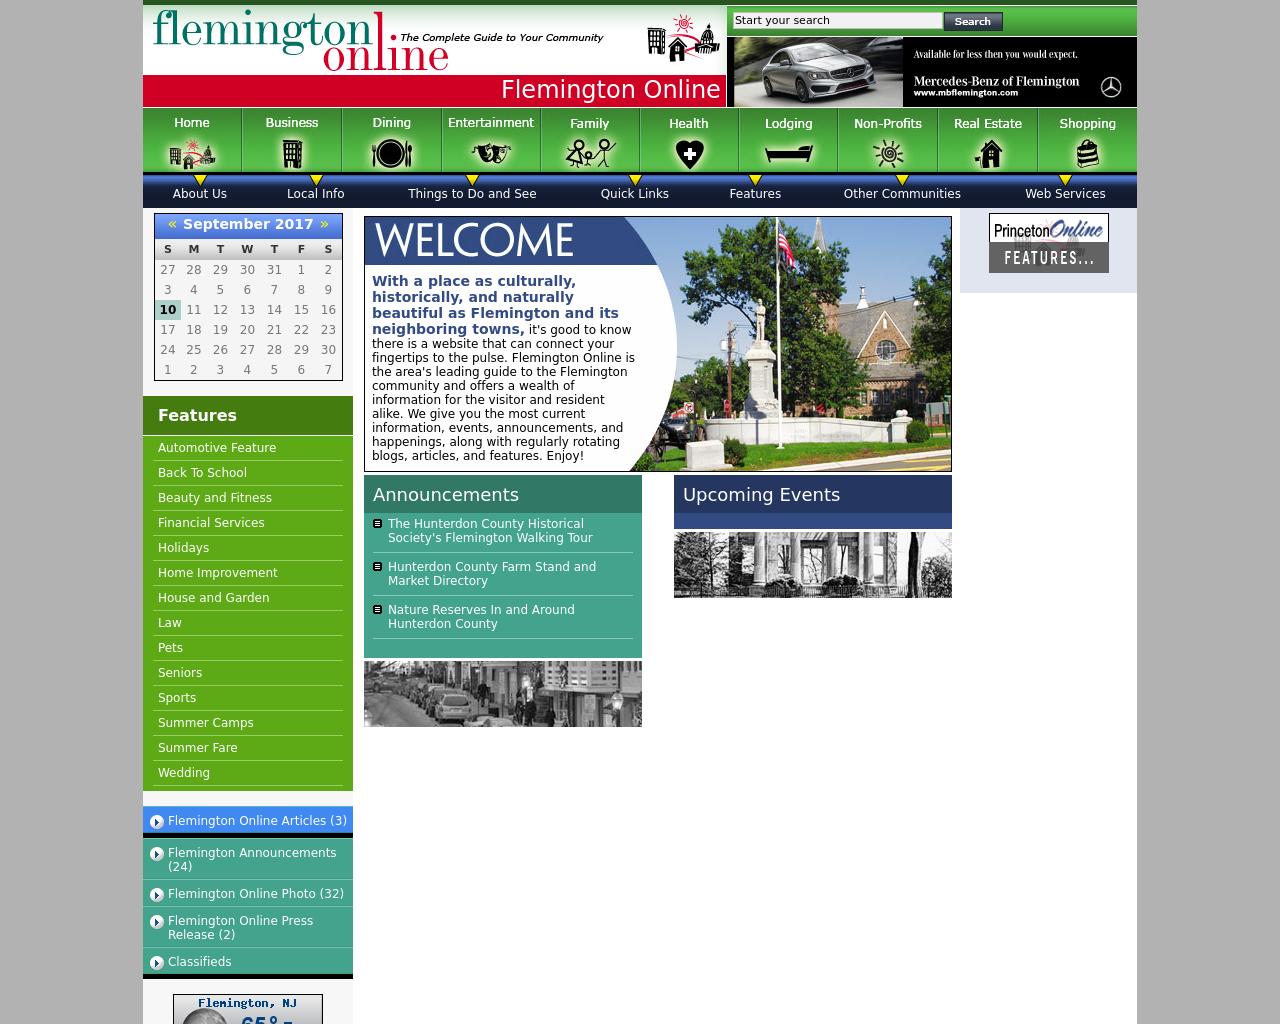 Flemington-Online-Advertising-Reviews-Pricing